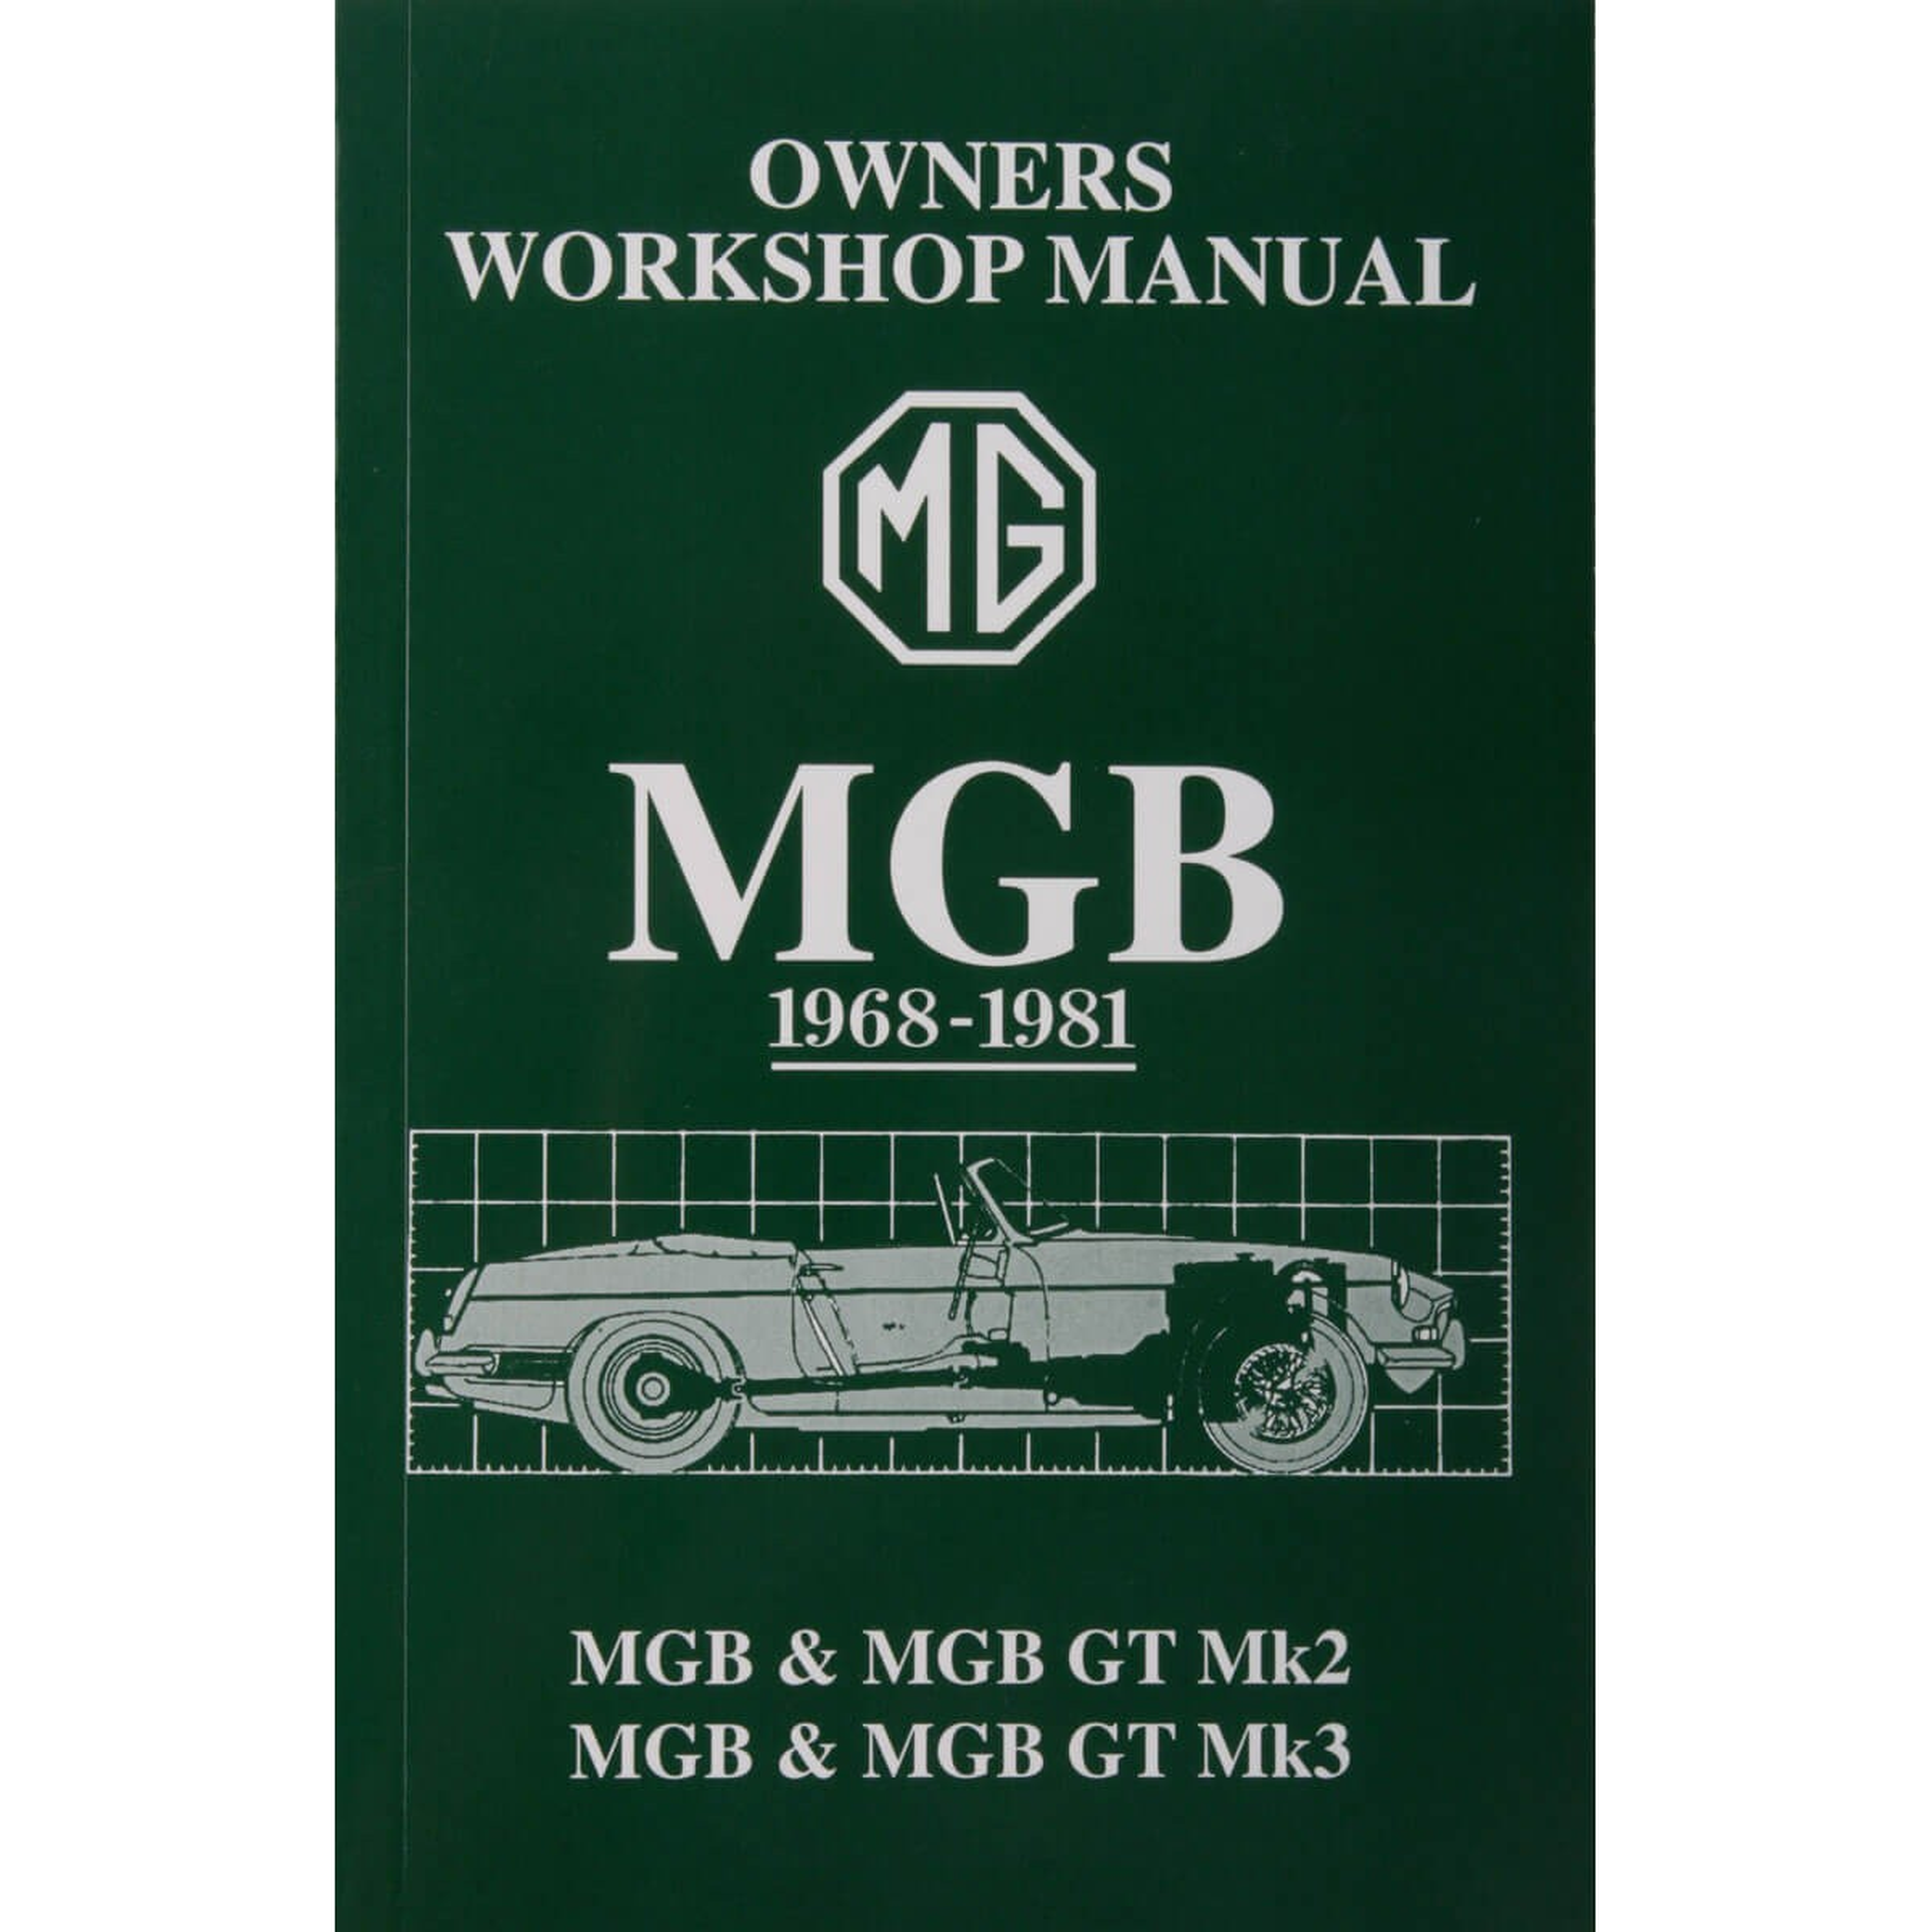 Mg Td Midget Drivers Owner/'S Handbook Glovebox Book